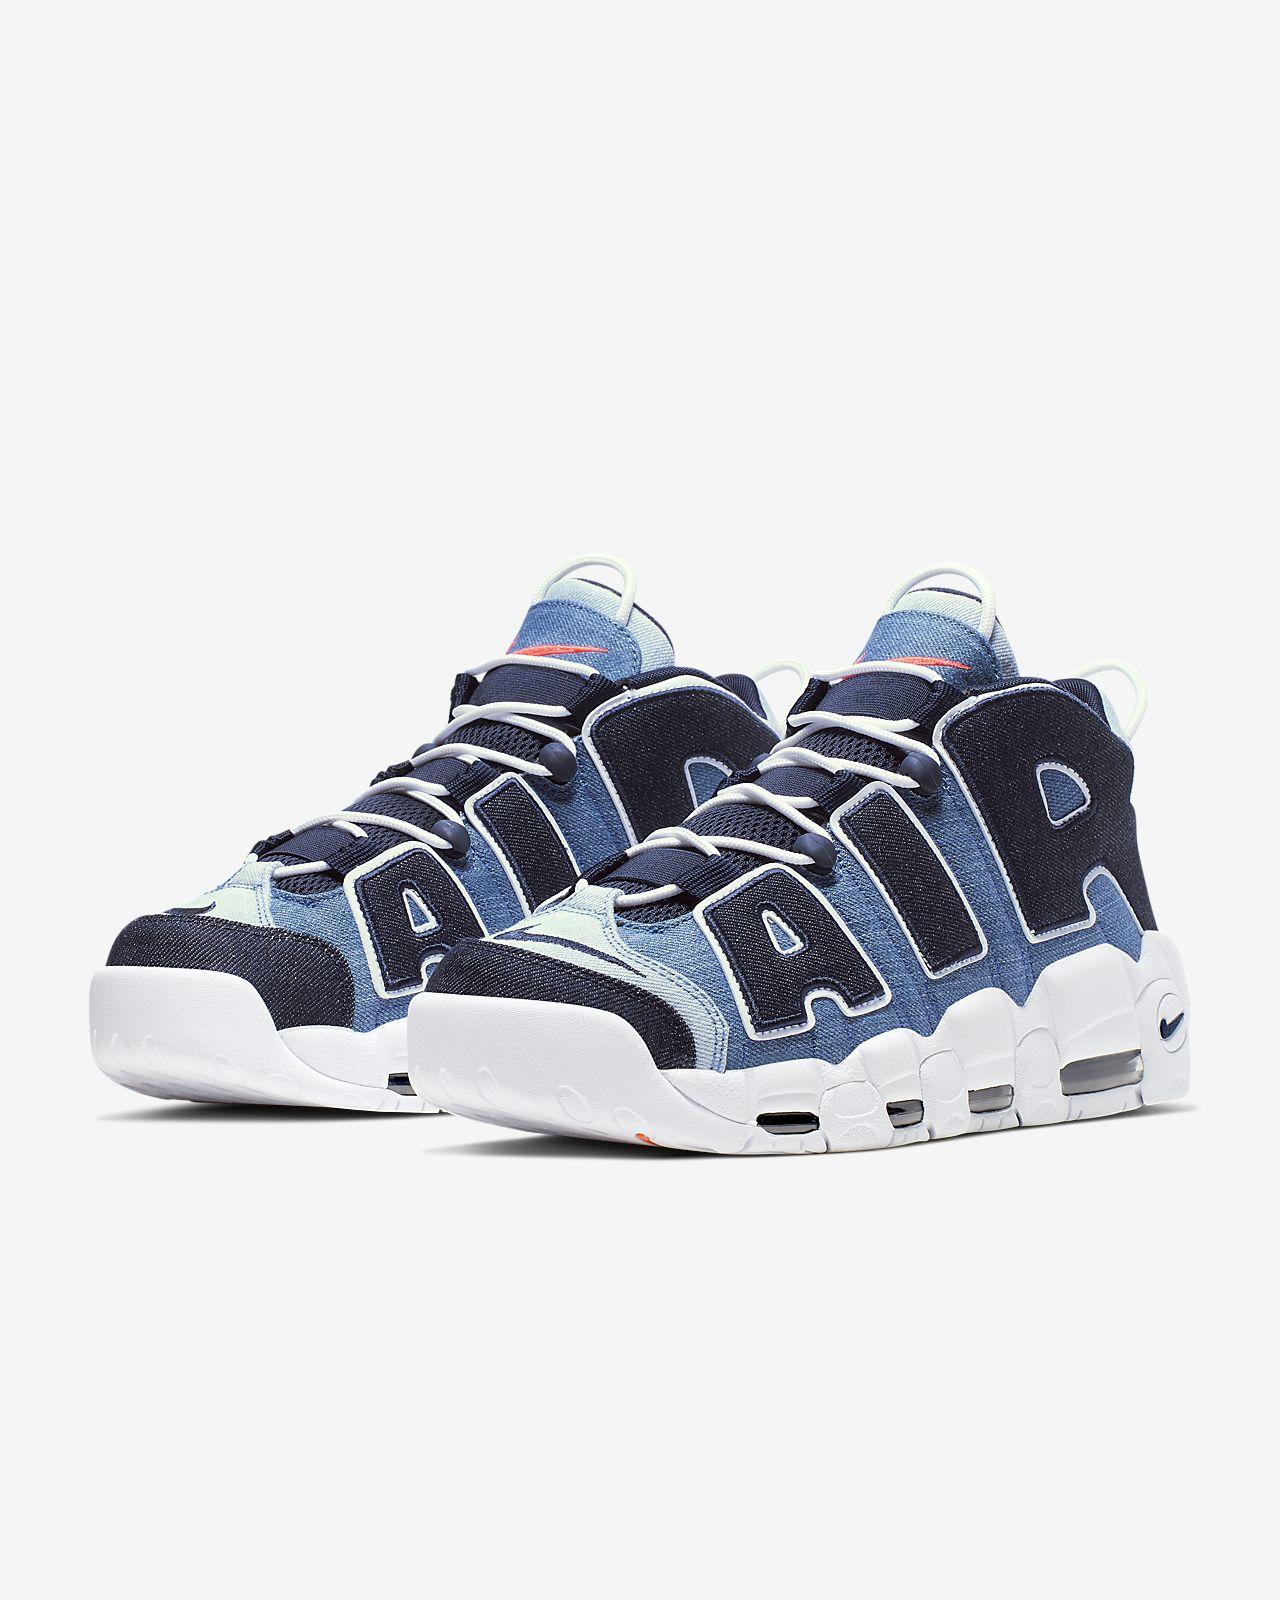 Nike Air More Uptempo '96 QS Men's Shoe